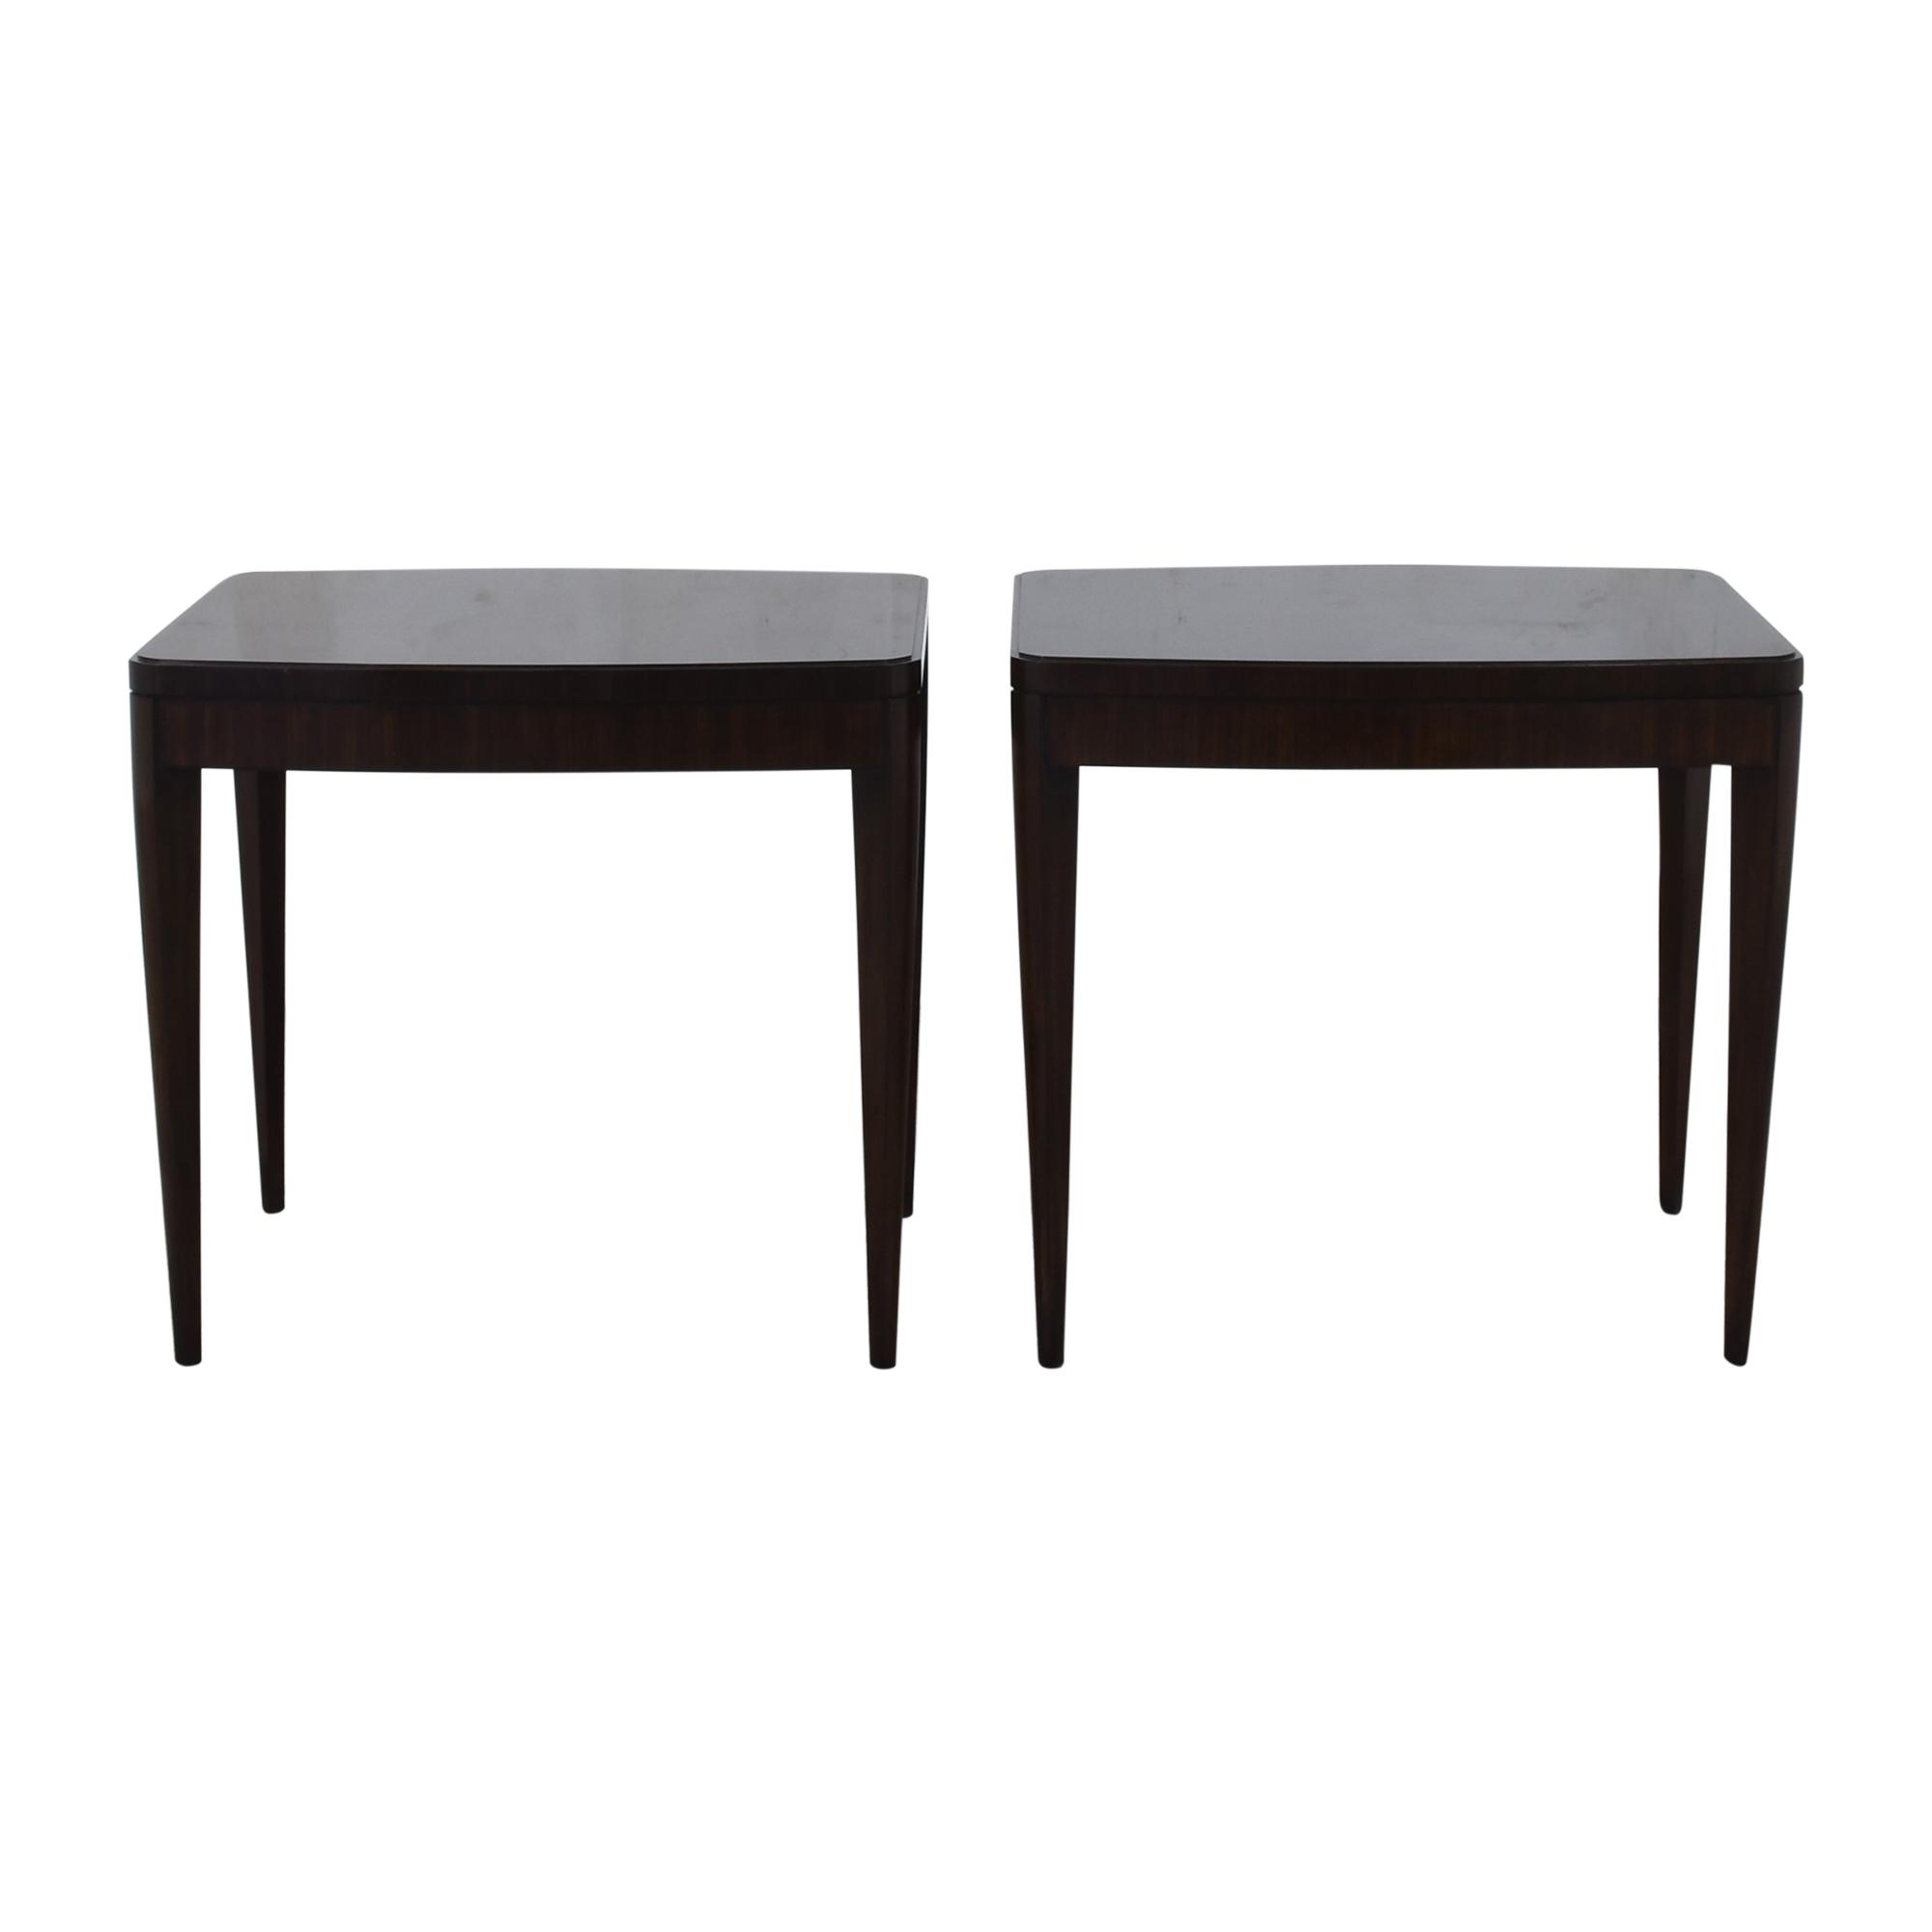 Henredon Furniture Henredon Furniture Contemporary End Tables ma